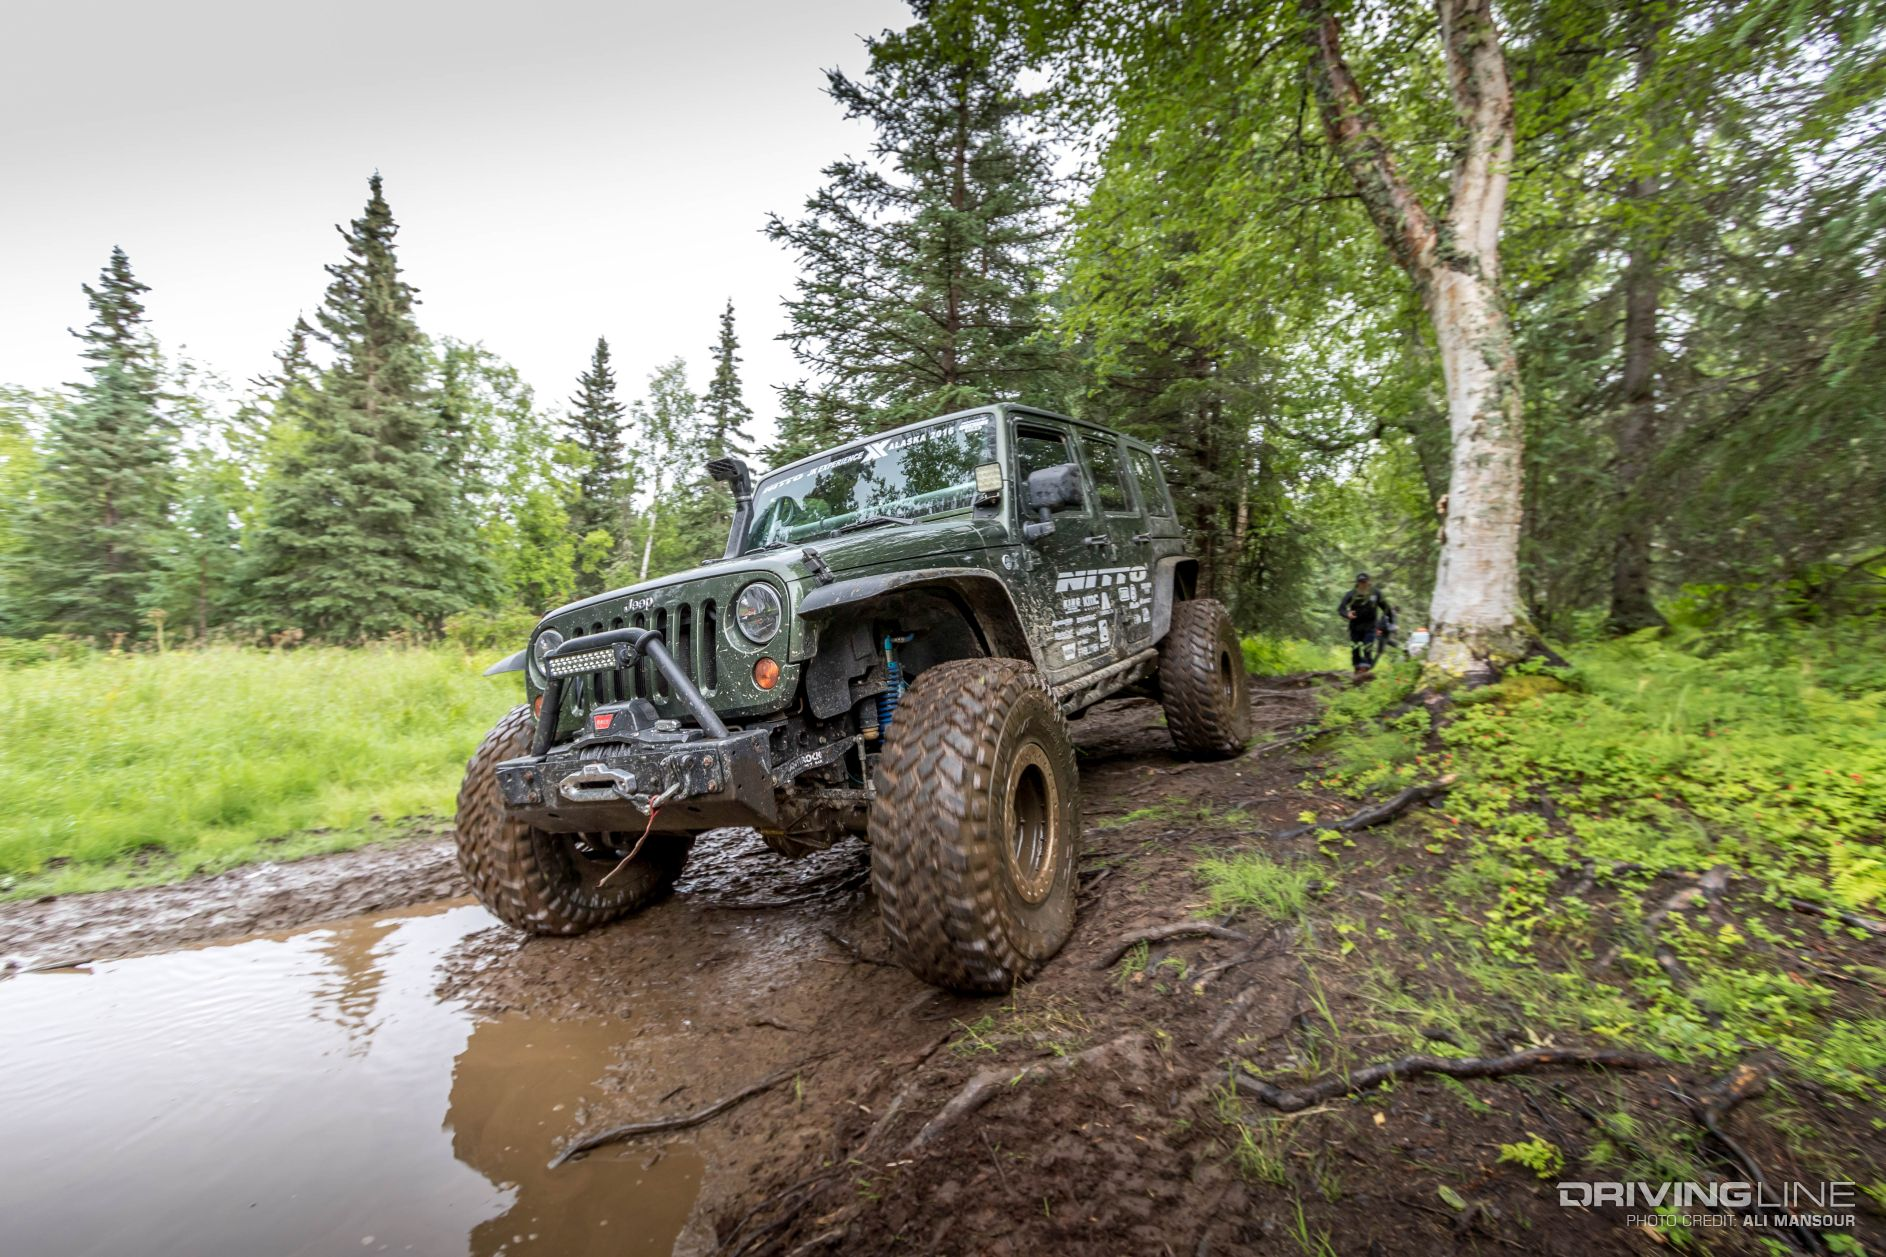 Best Diesel Truck 2016 >> Jeep Wrangler JK's of the 2016 Nitto JKX Alaska | DrivingLine